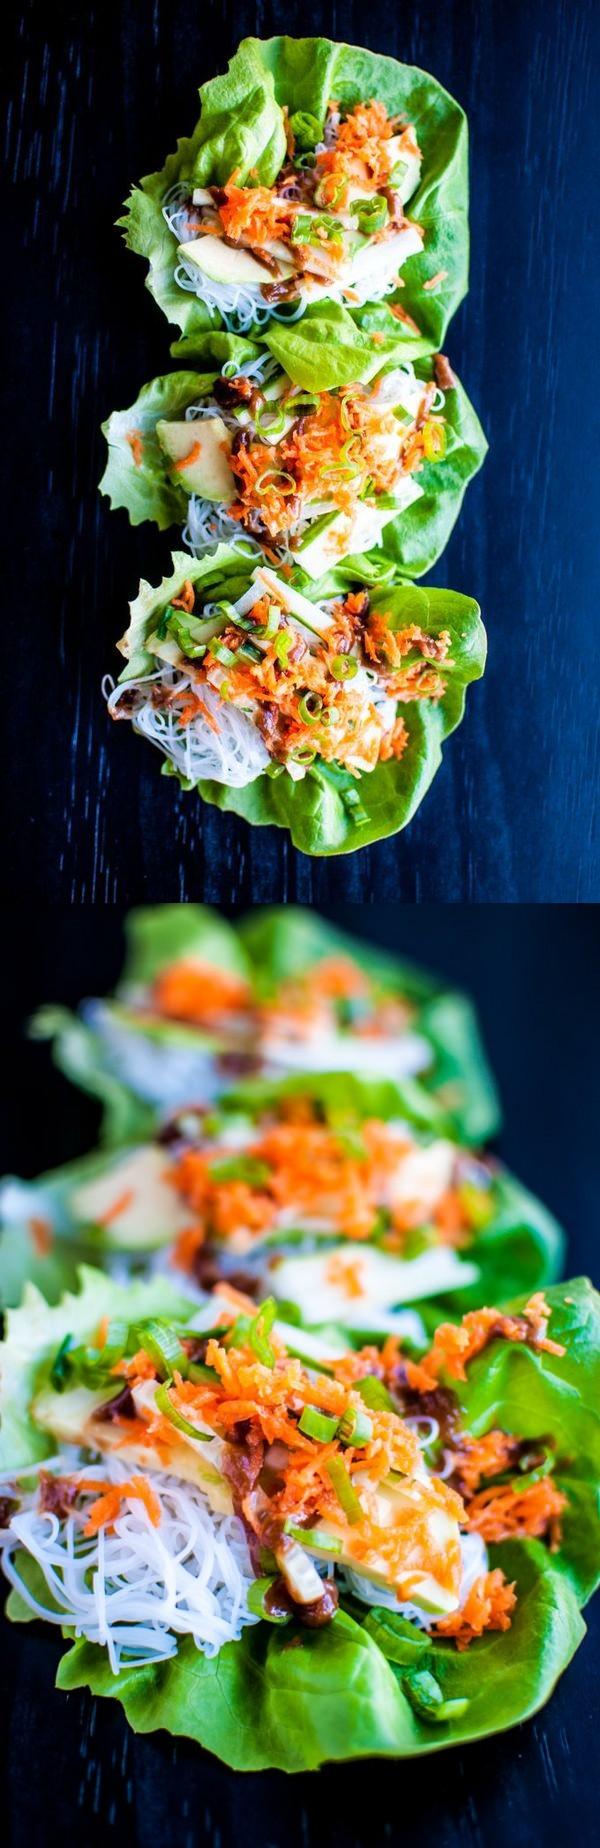 Veggie Lettuce Wraps with Peanut Sauce